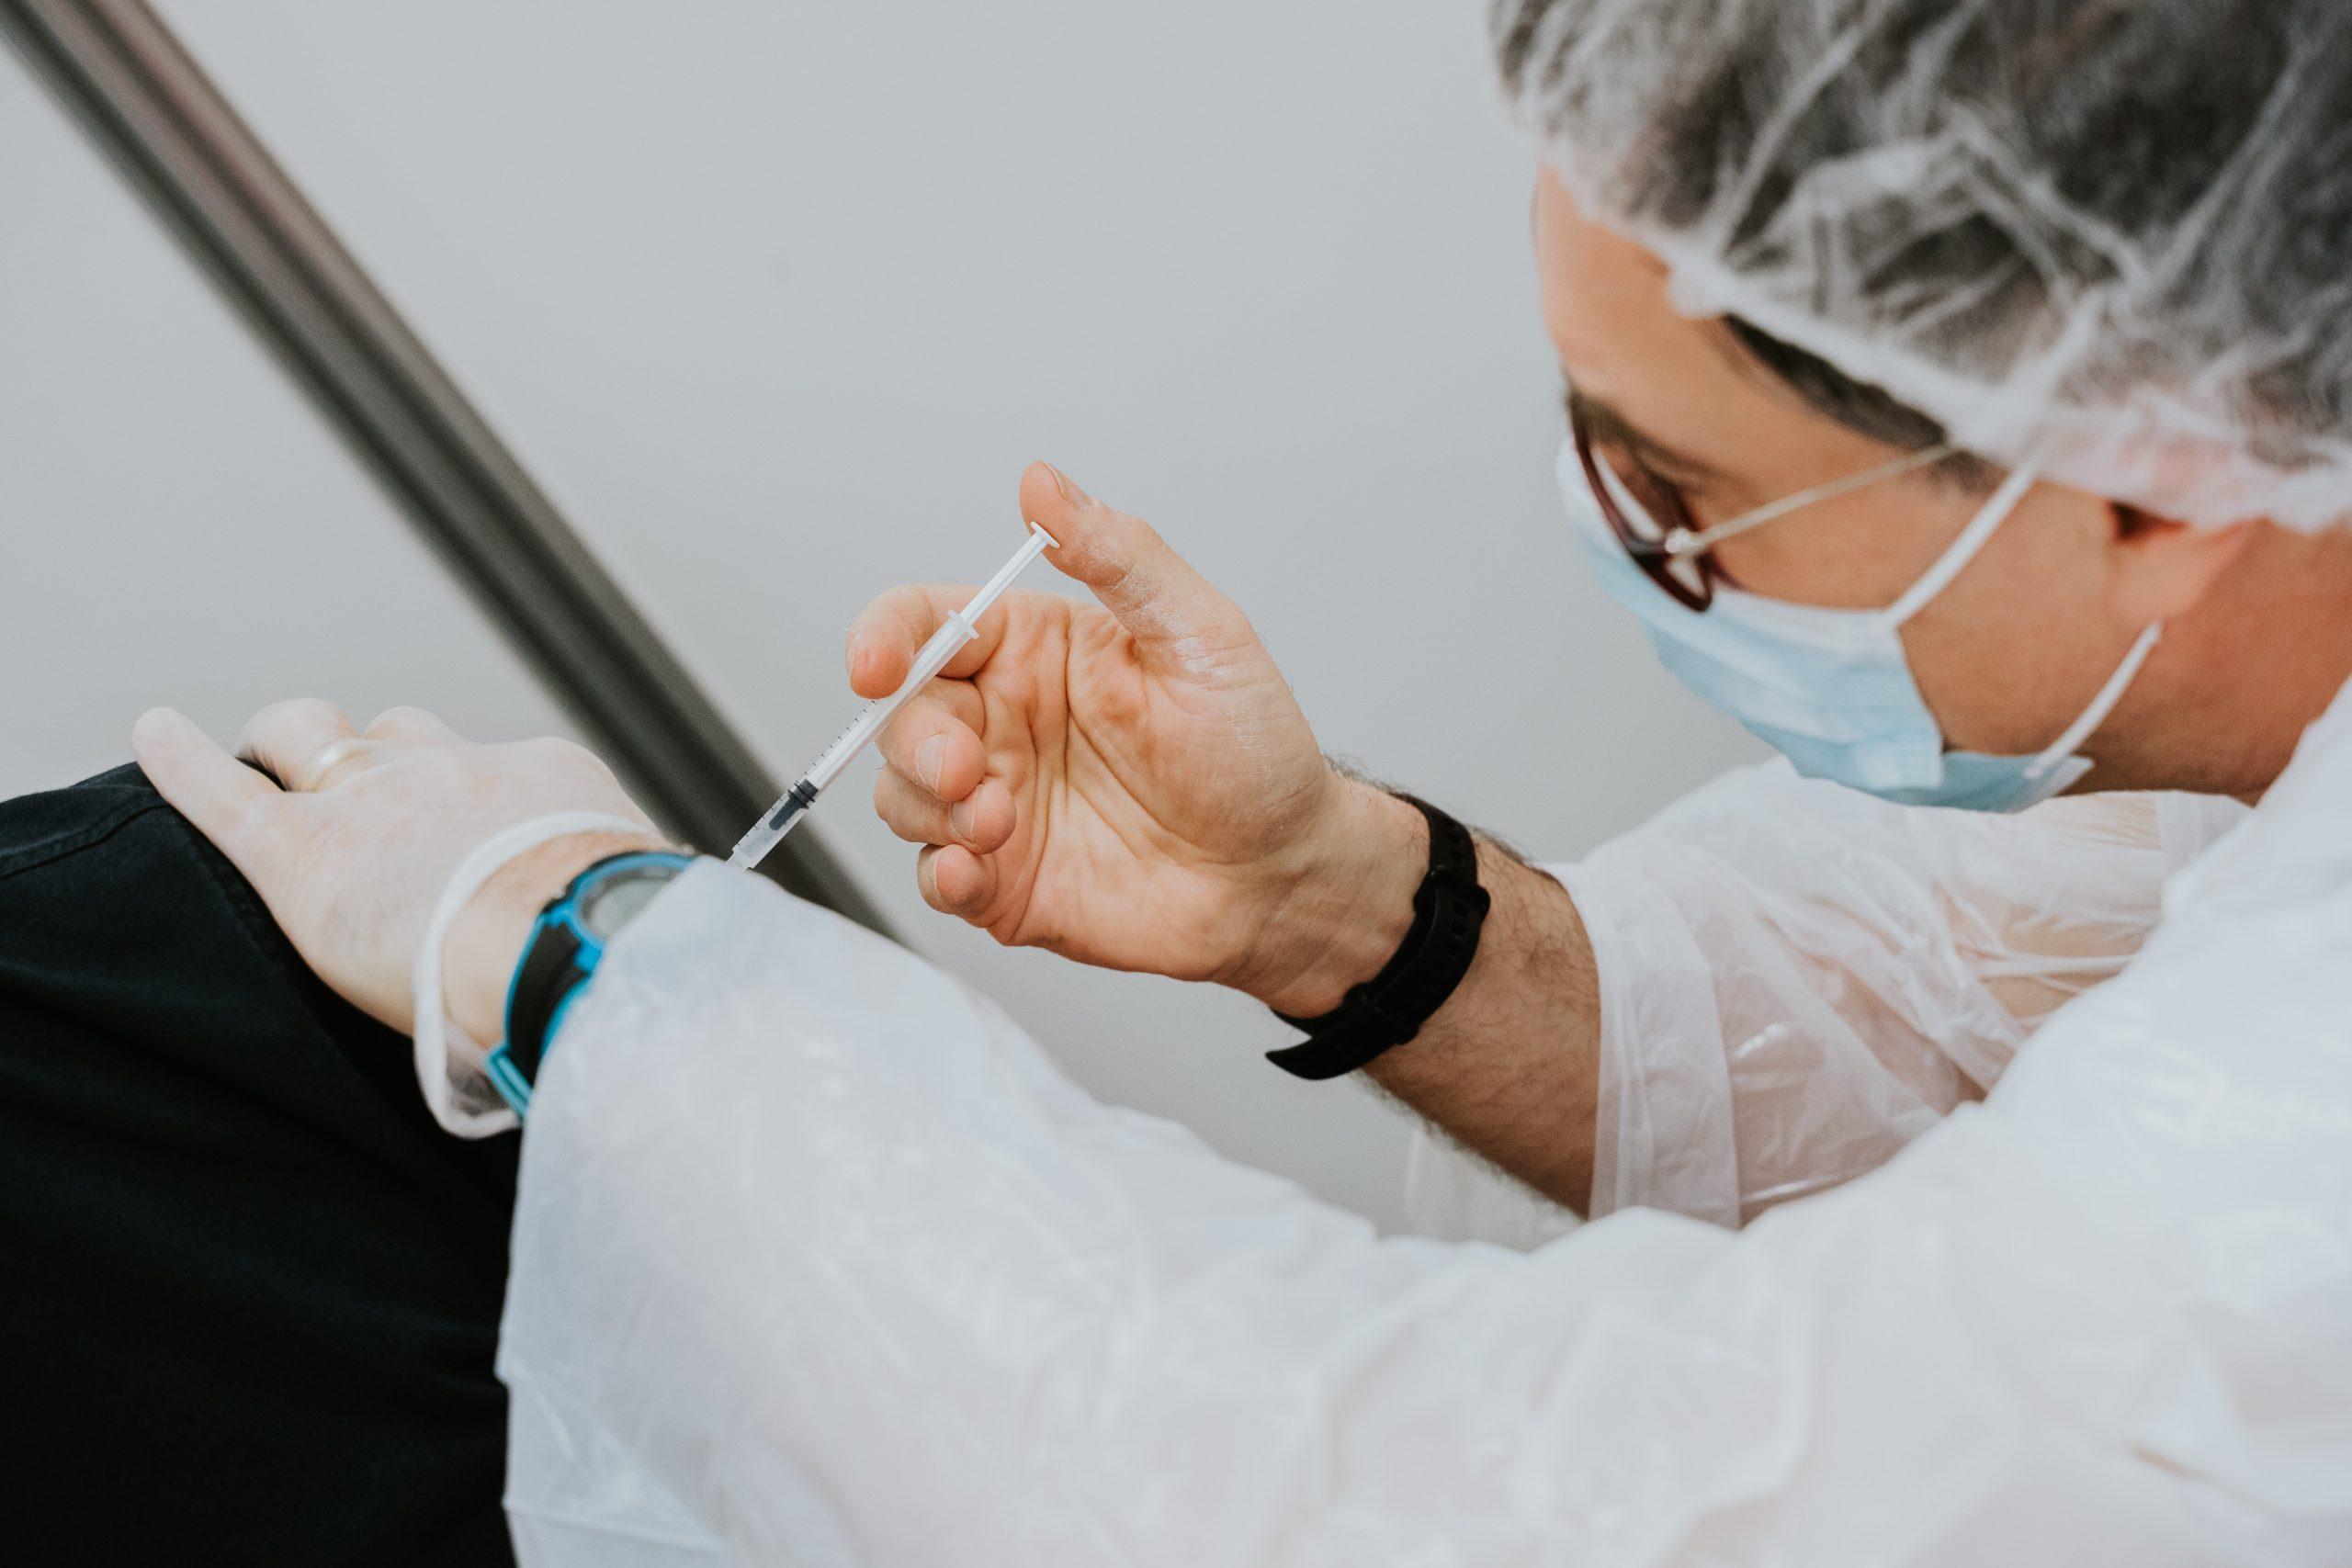 Le vaccin, clé de la liberté